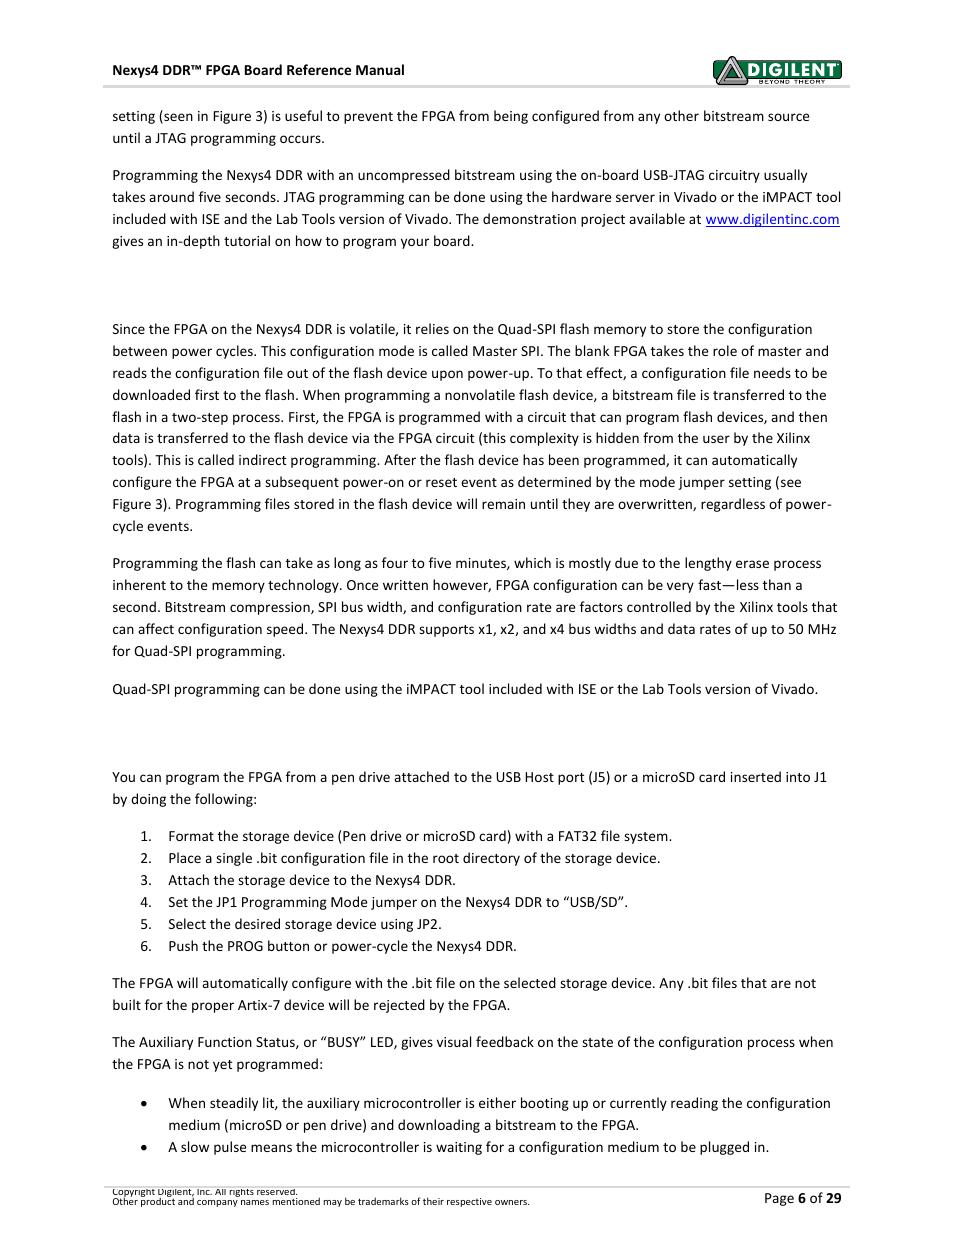 2 quad-spi configuration, 3 usb host and micro sd programming